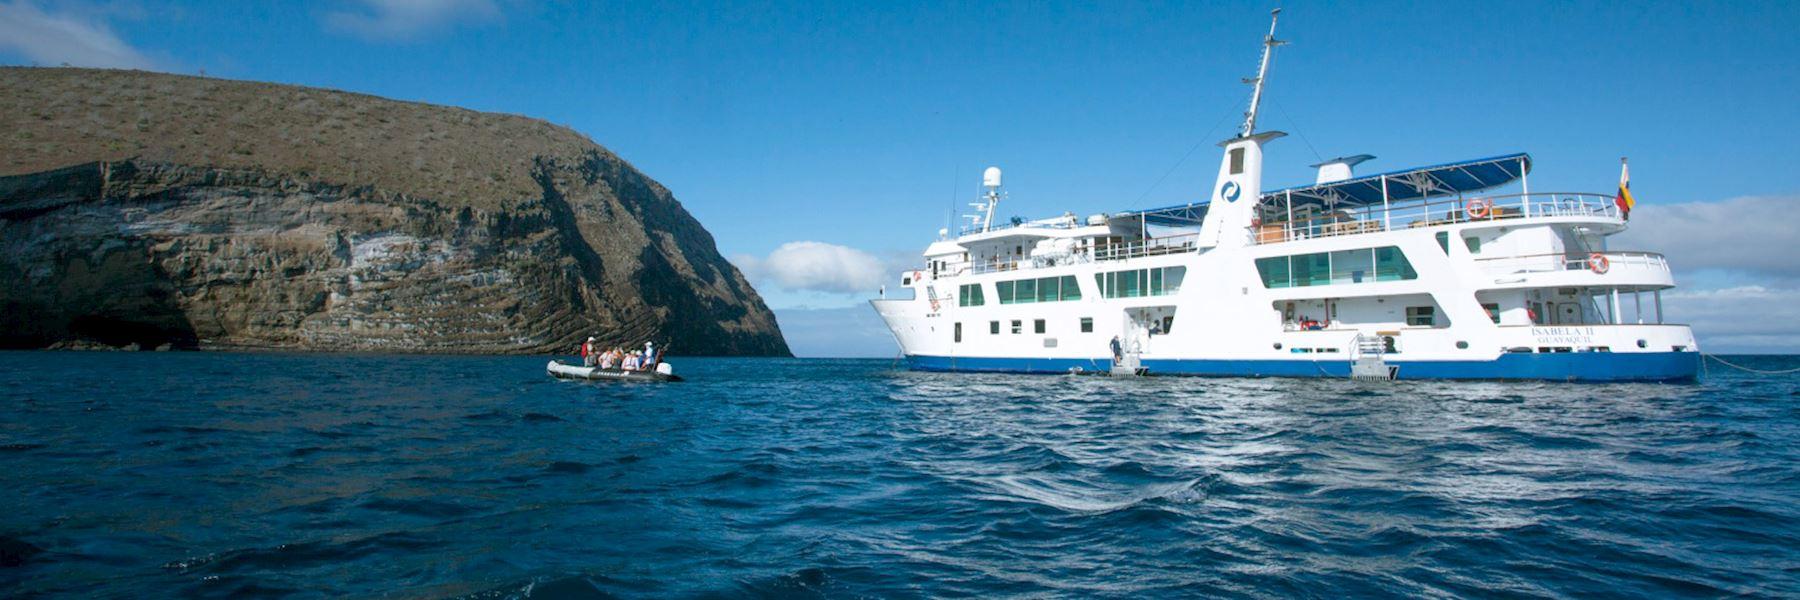 Cruise Ships in The Galapagos Islands: Isabela II